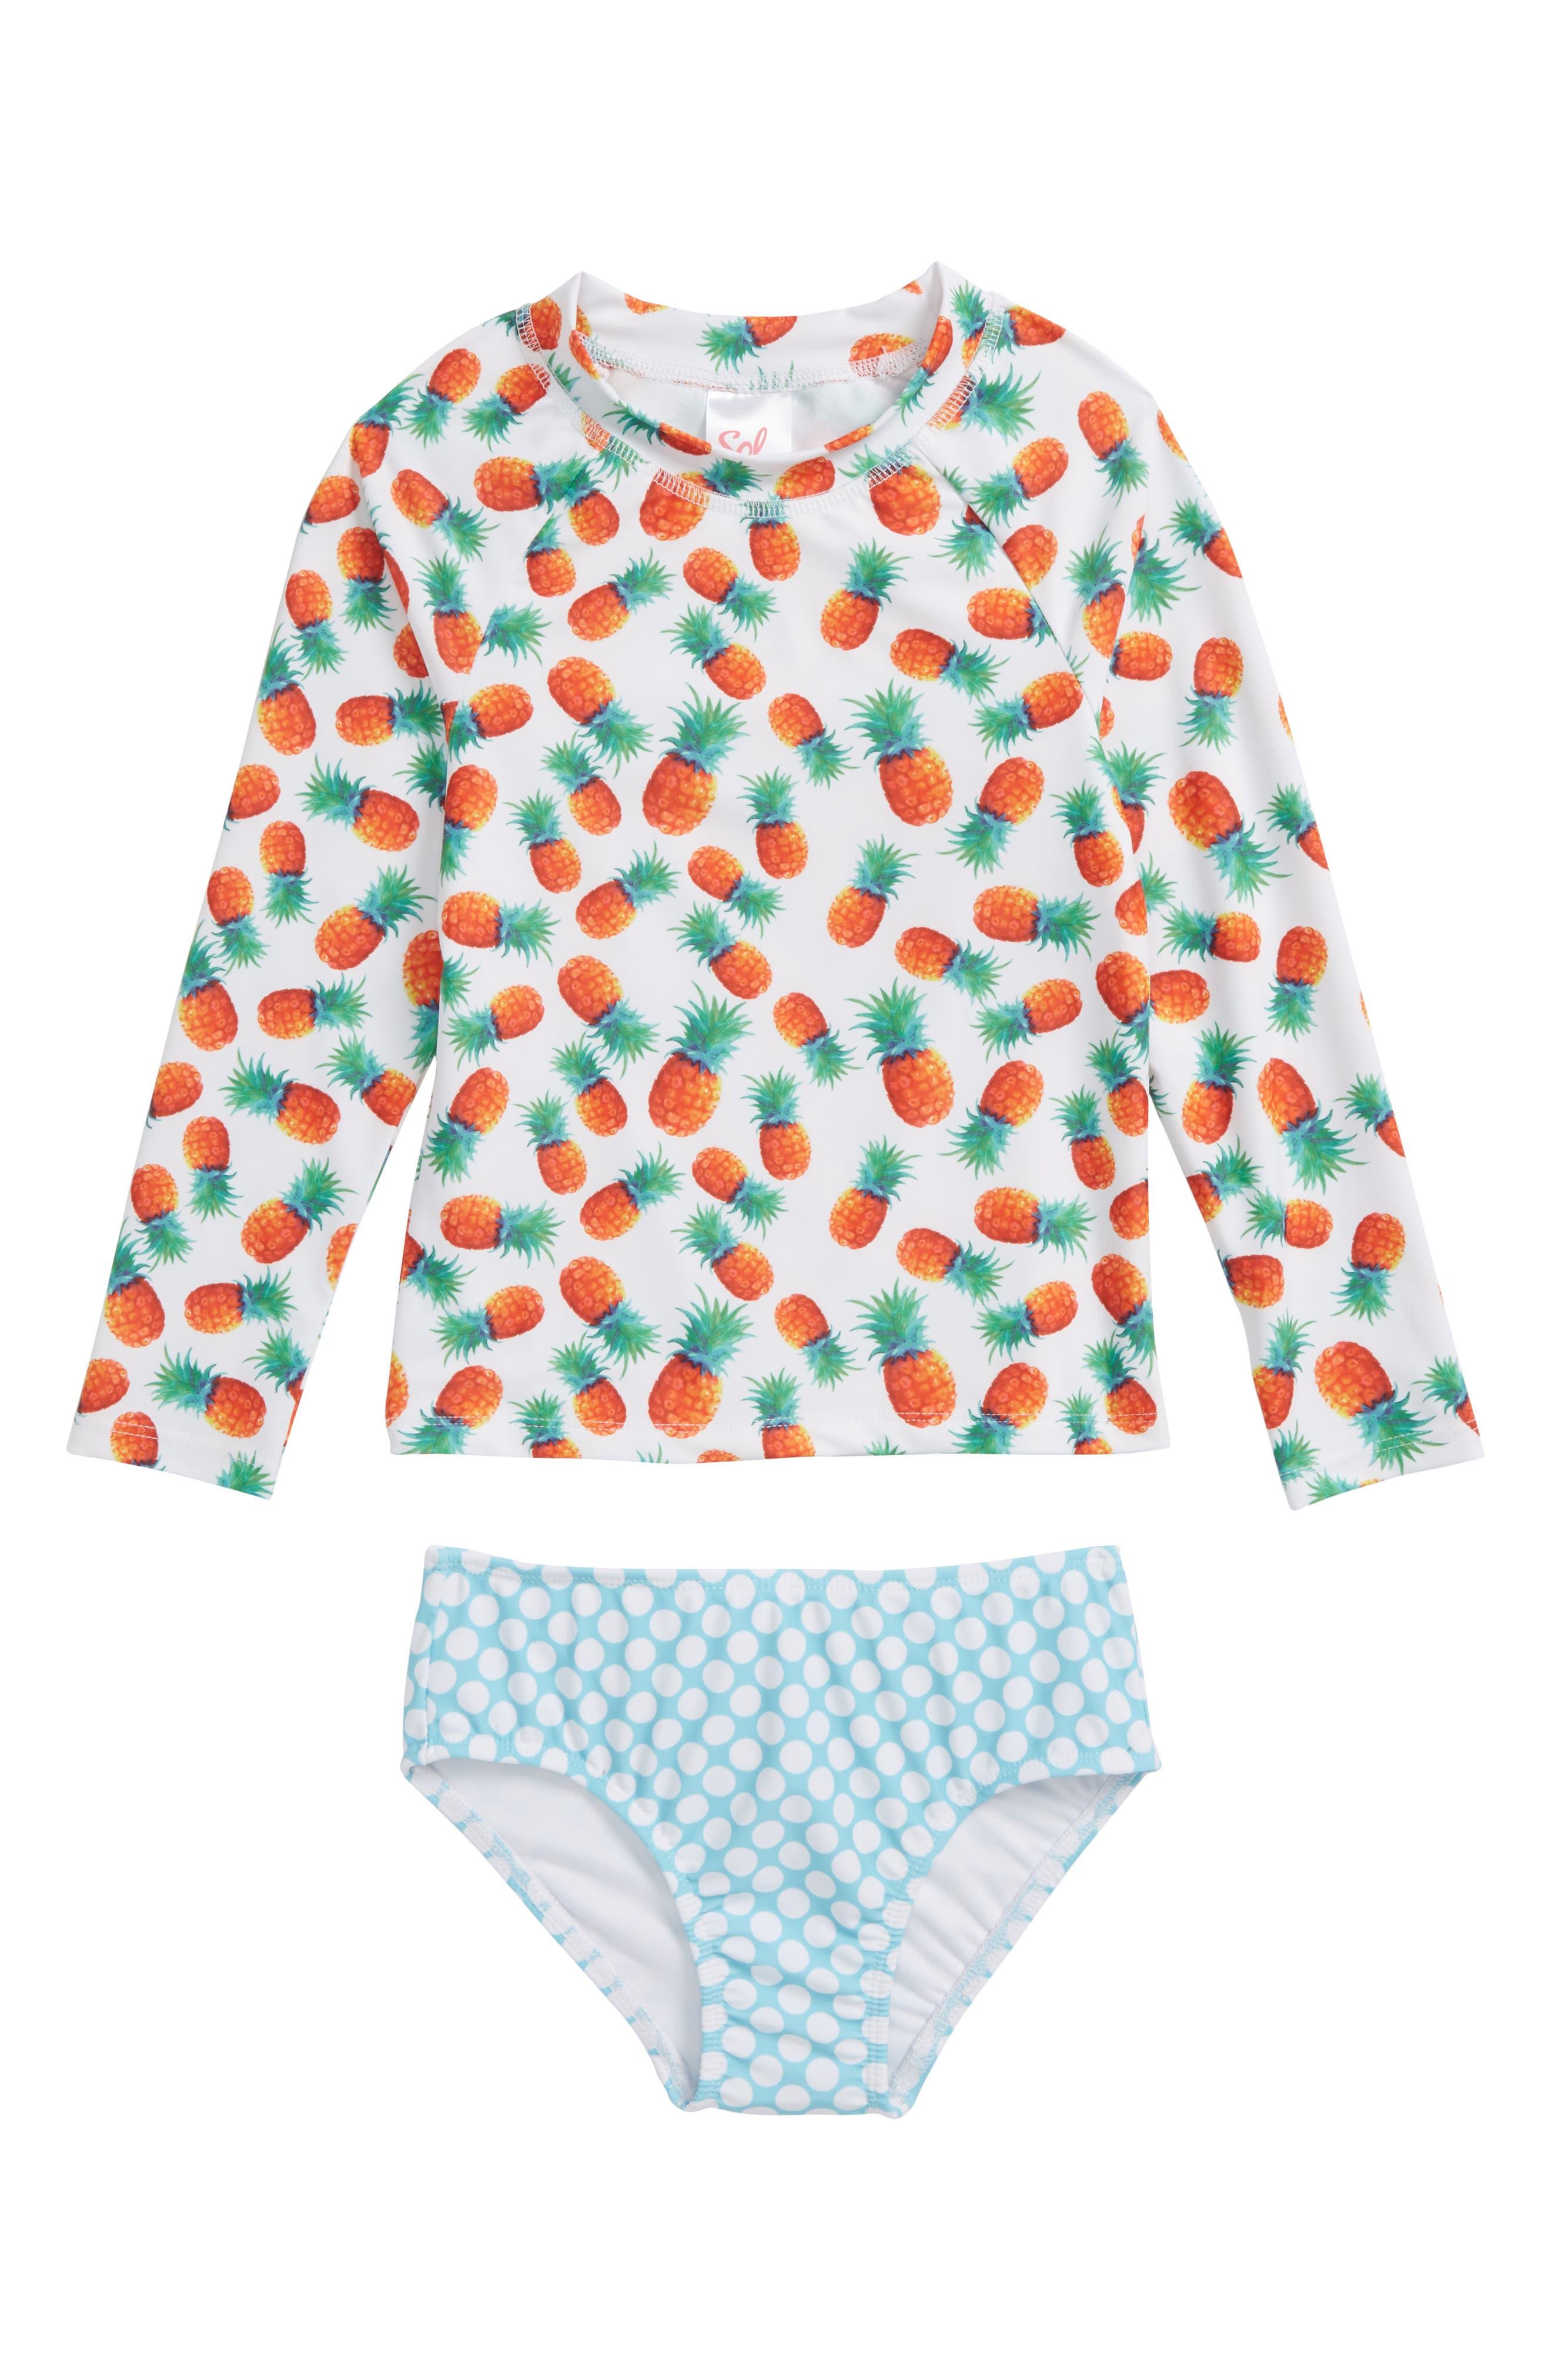 Main Image - Sol Swim Pineapple Disco Two-Piece Rashguard Swimsuit (Toddler Girls & Little Girls)